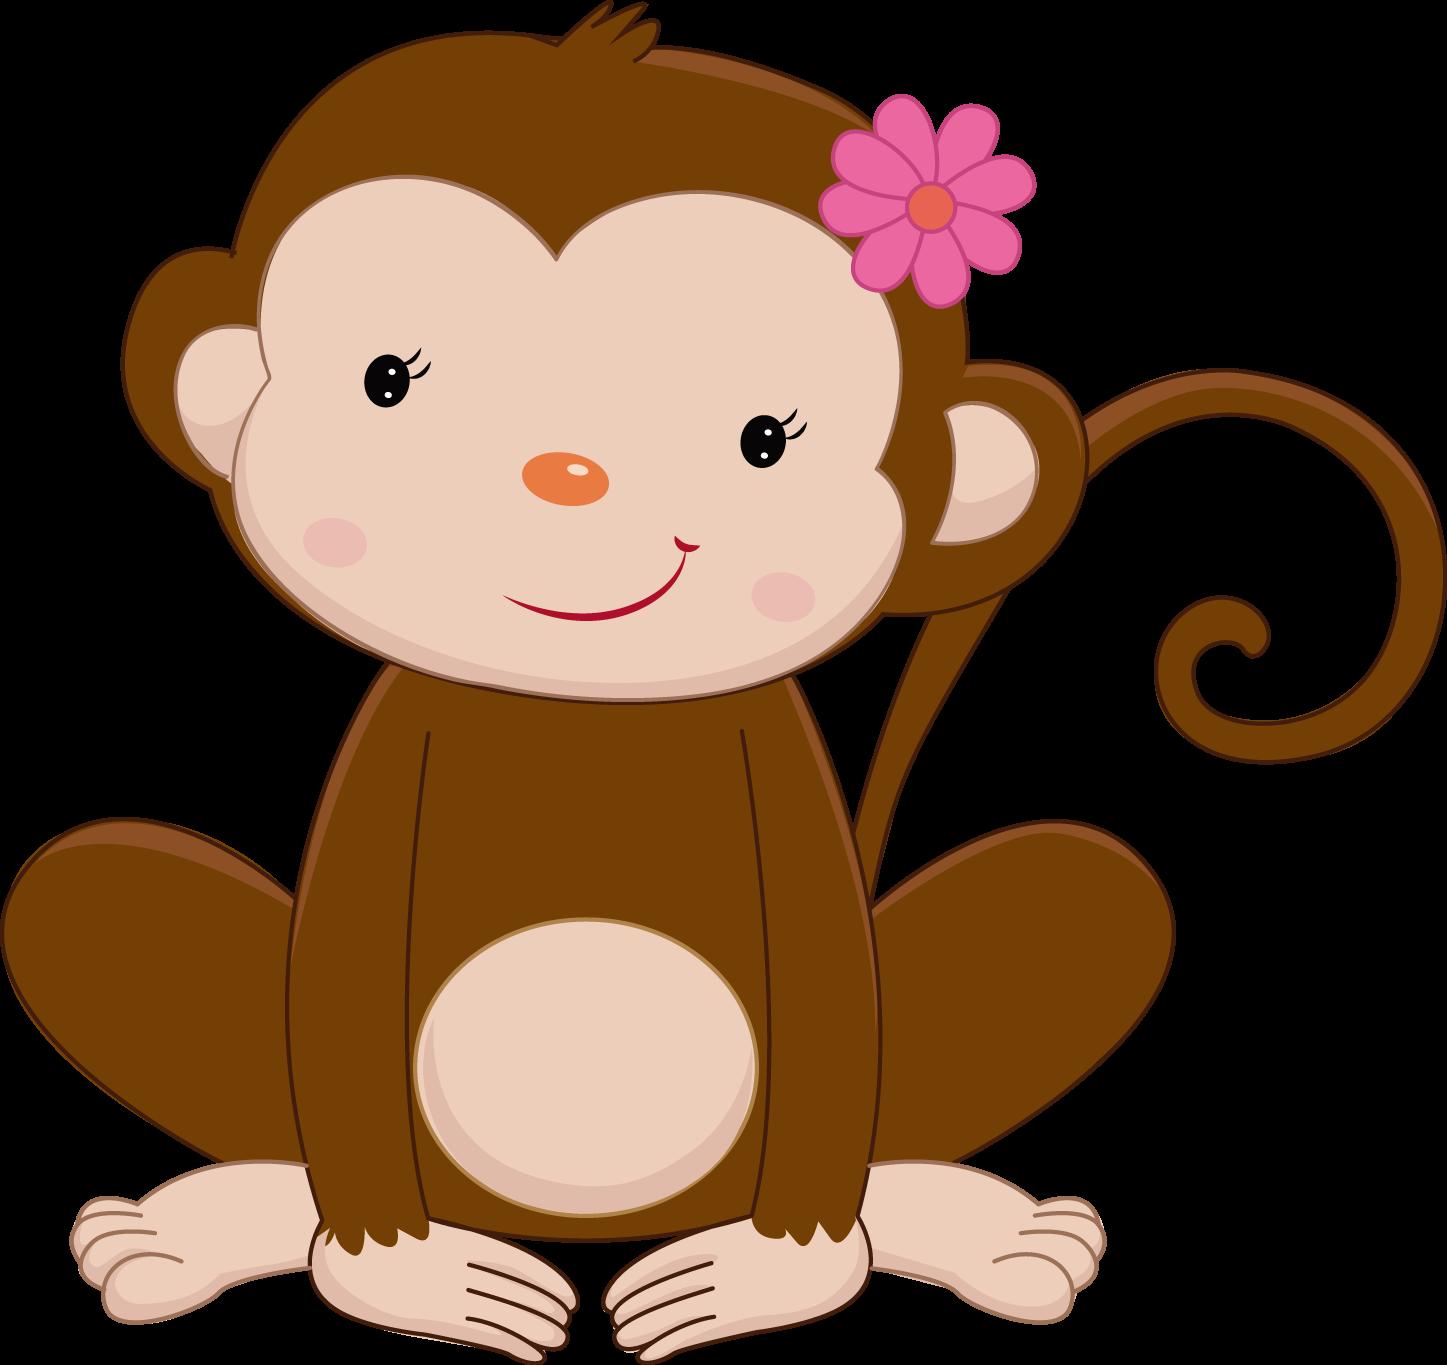 Safari clipart rainforest monkey Girly Girly Minus Pink Pretty